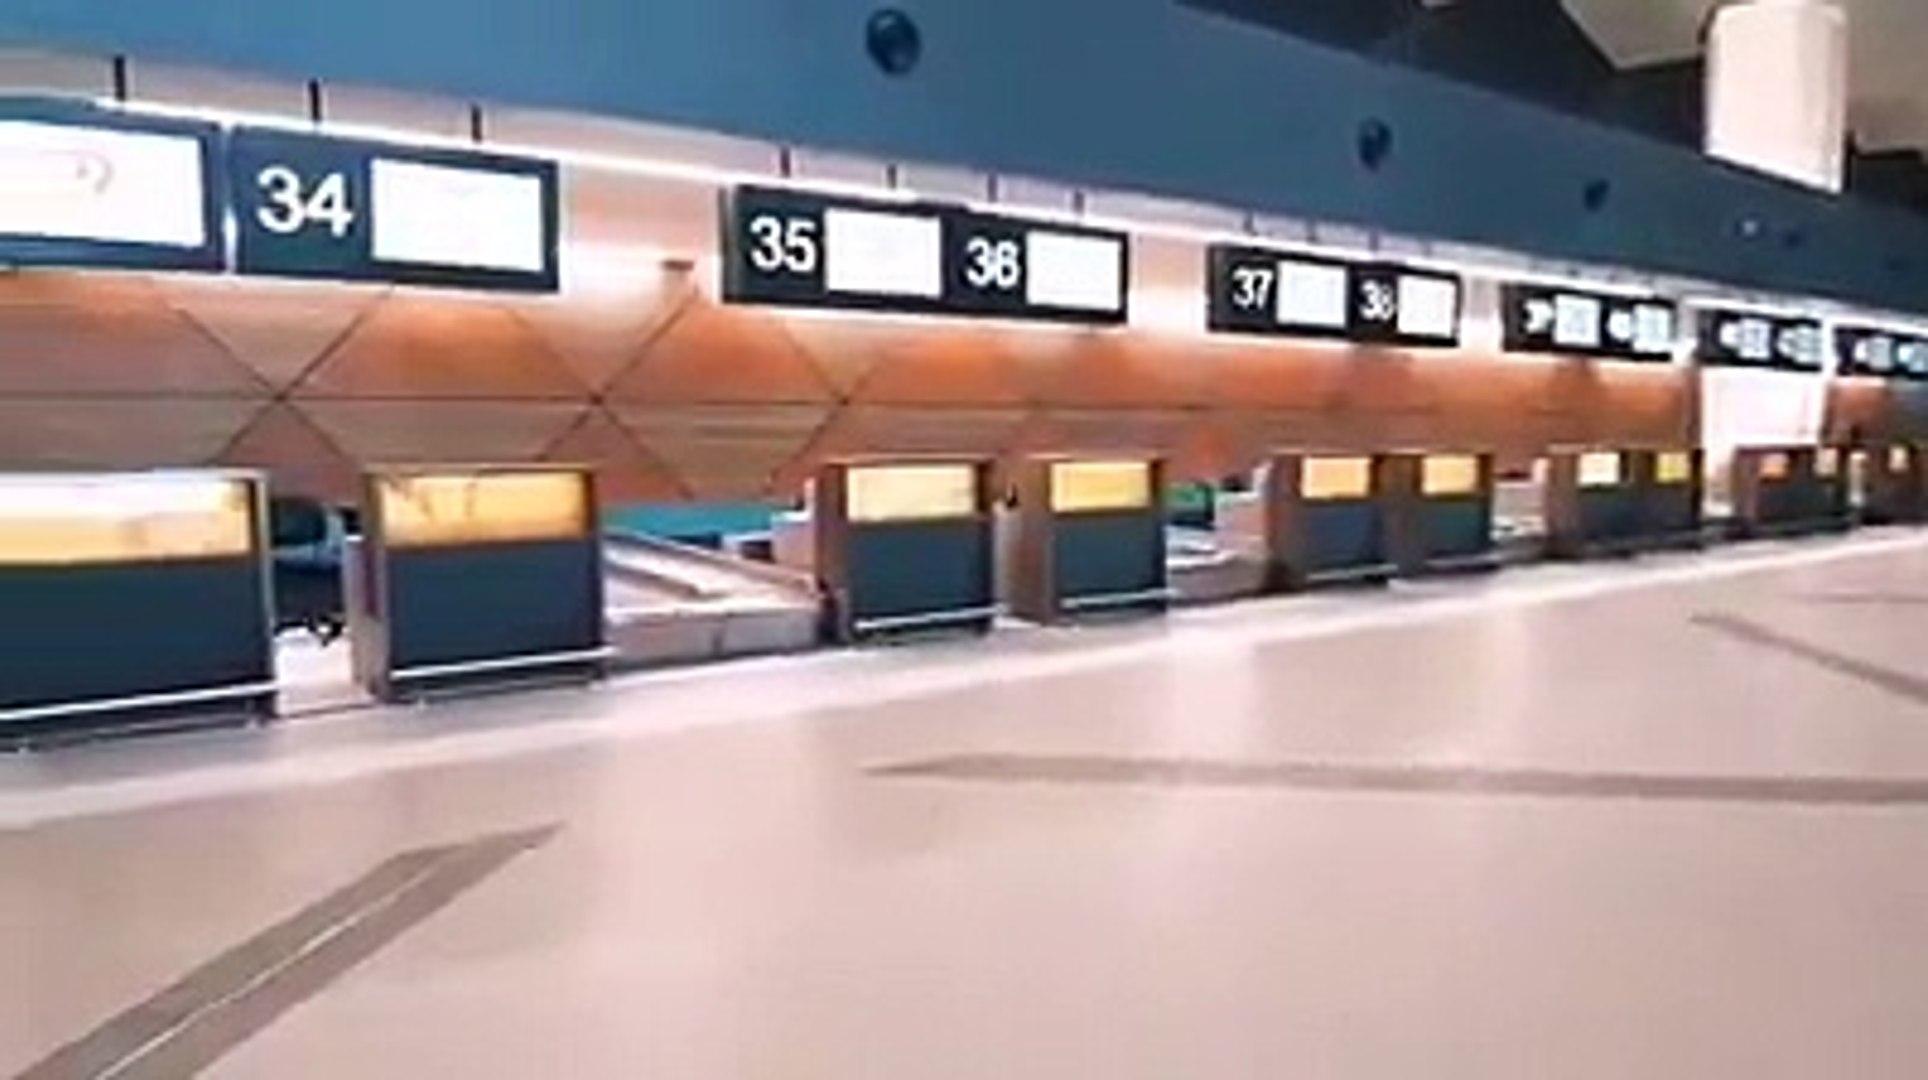 Welcome to Kuwait Airways Terminal 4 #kuwait #الكويتShare the videos &  photos by whatsapp : 94418559#q8 #kuwaitup2date #kuwaituptodate #news  #kuwaitnews